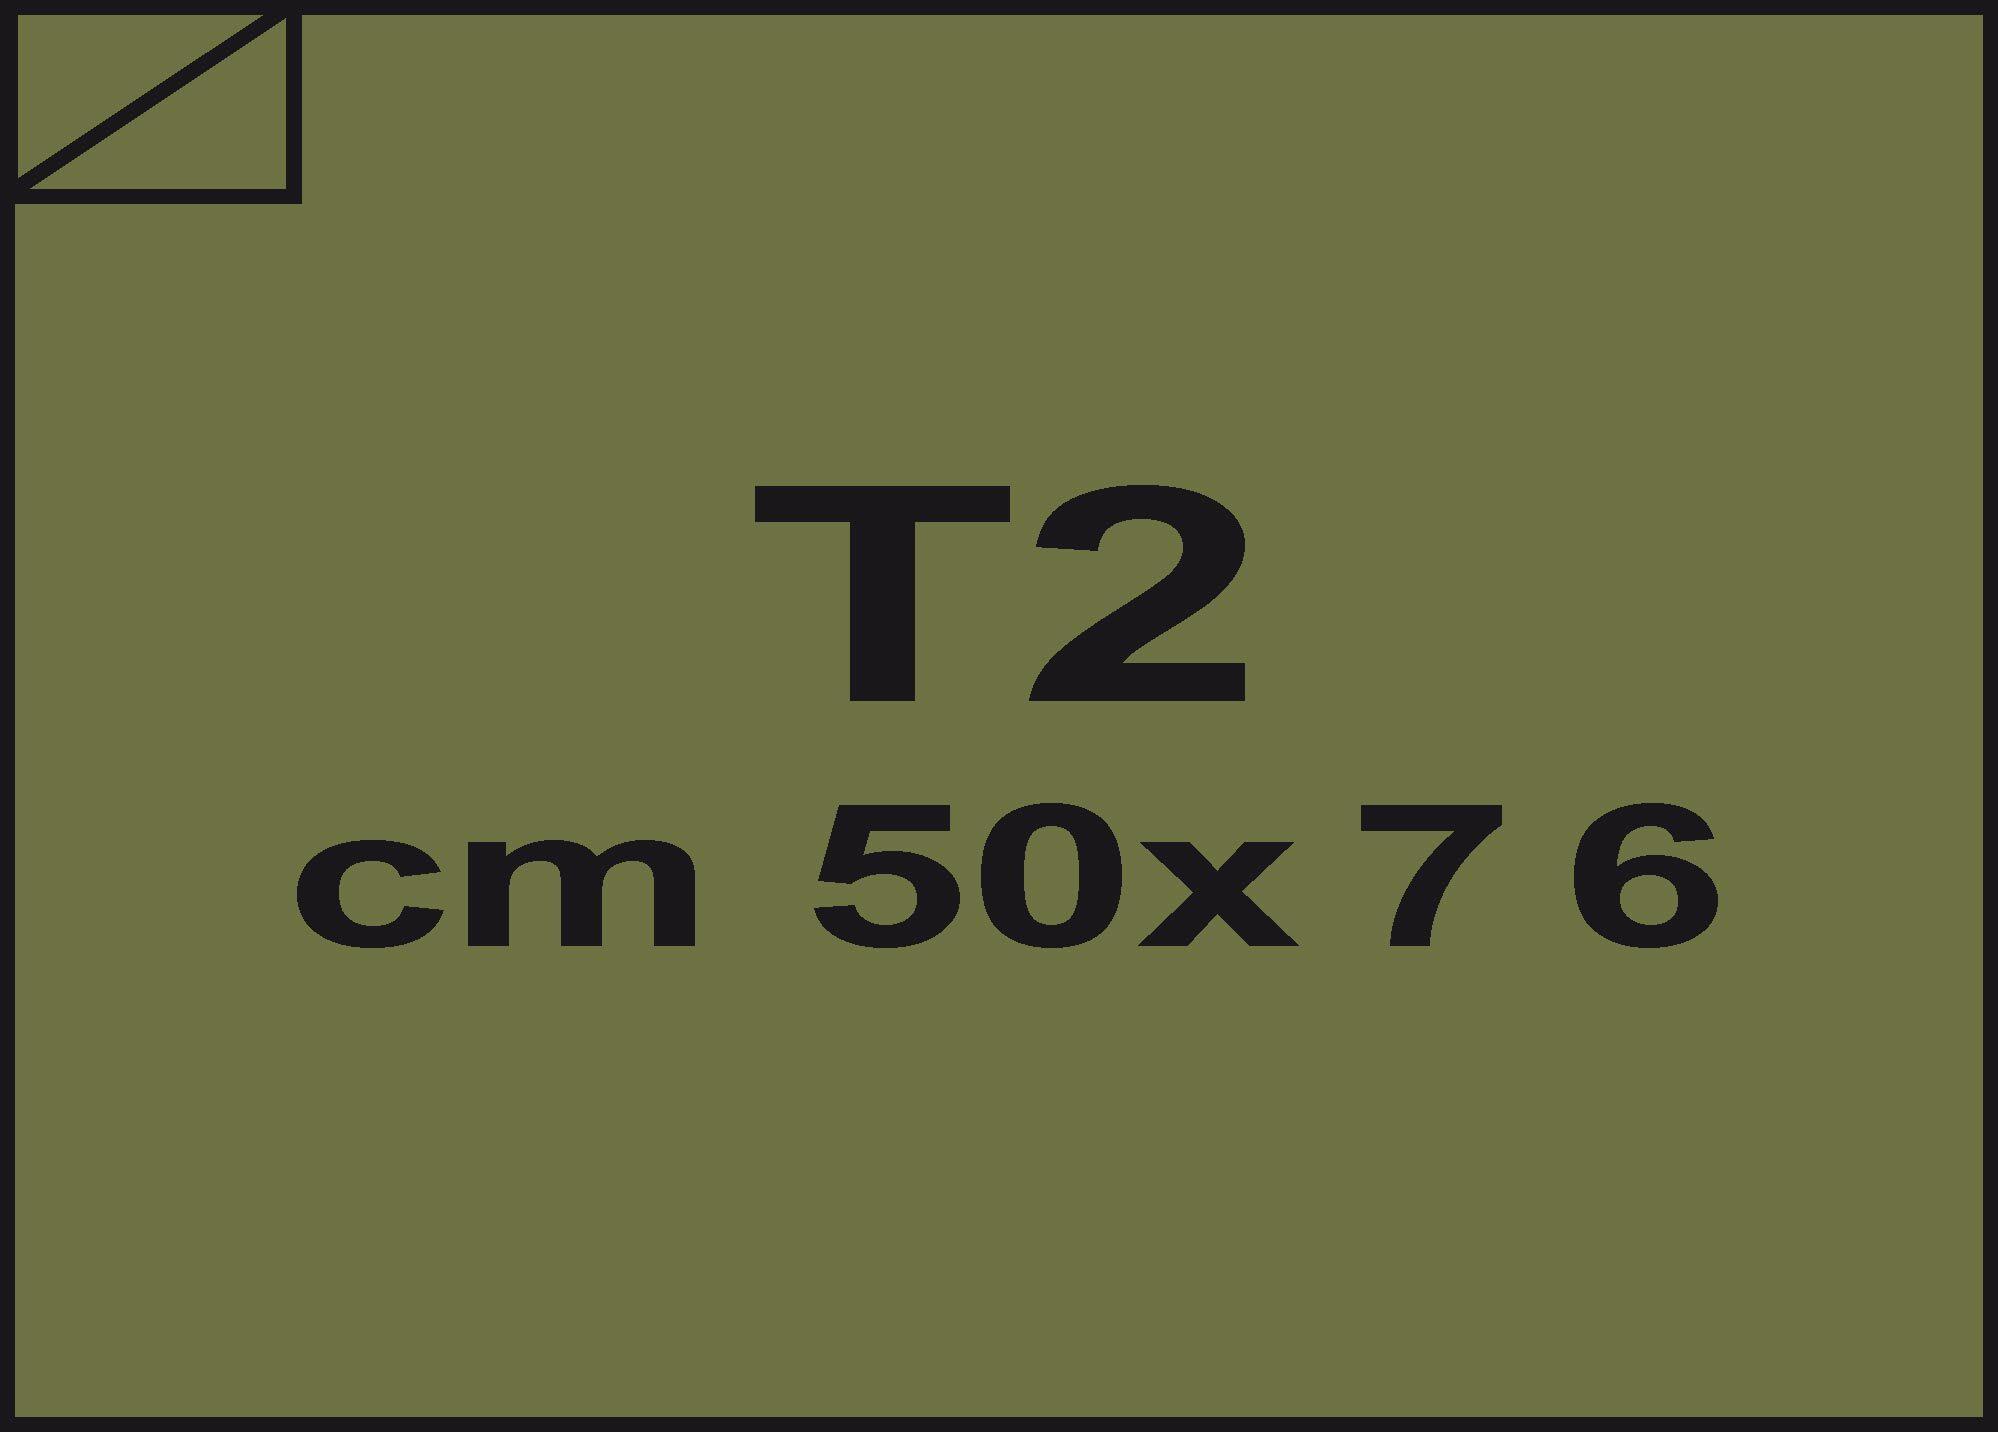 carta Carta velina Verde oliva 42, formato T2 (50x76cm), 18grammi x mq.